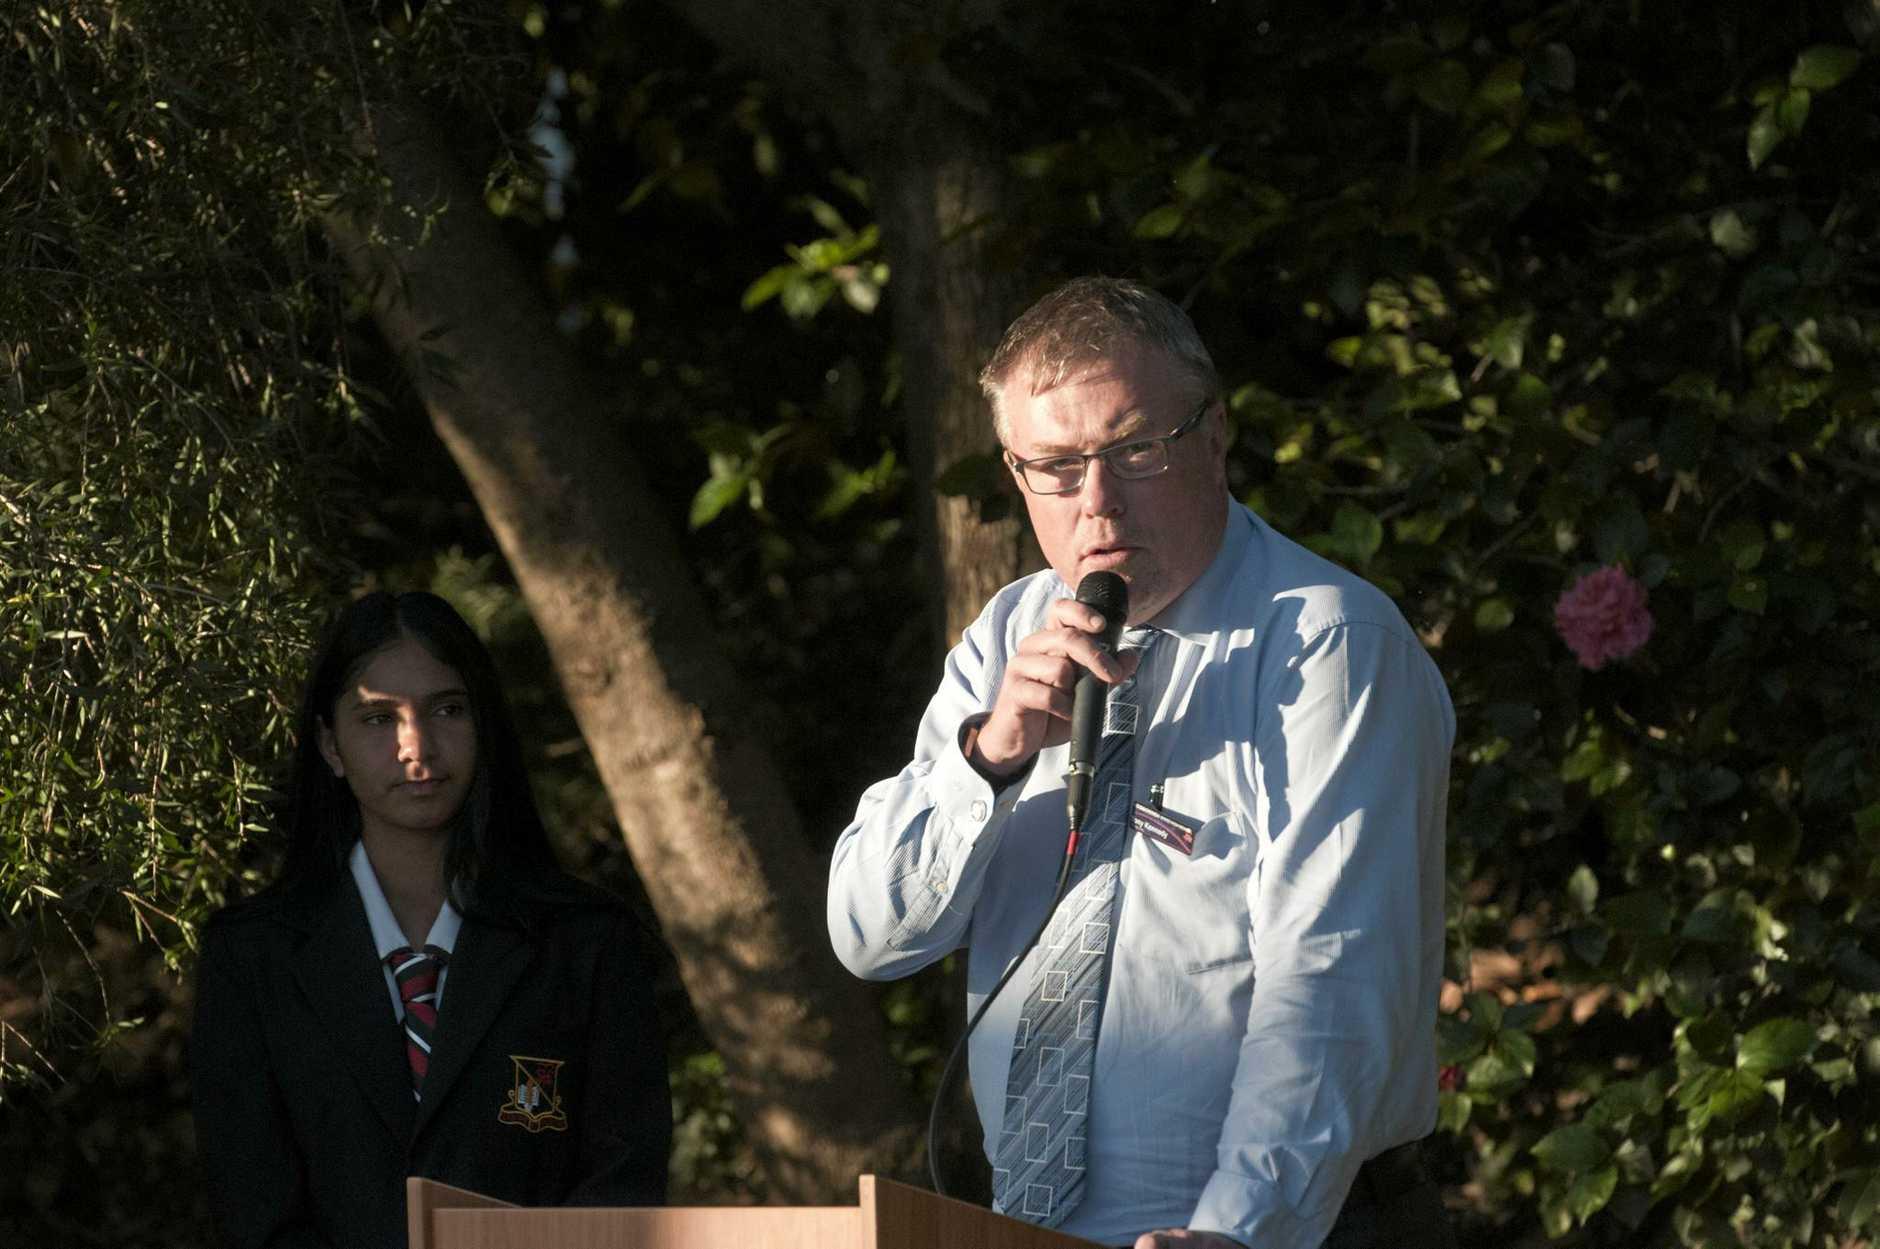 Toowoomba State High School principal Tony Kennedy talks at the school's Yarning Circle opening, Thursday, May 25, 2017.